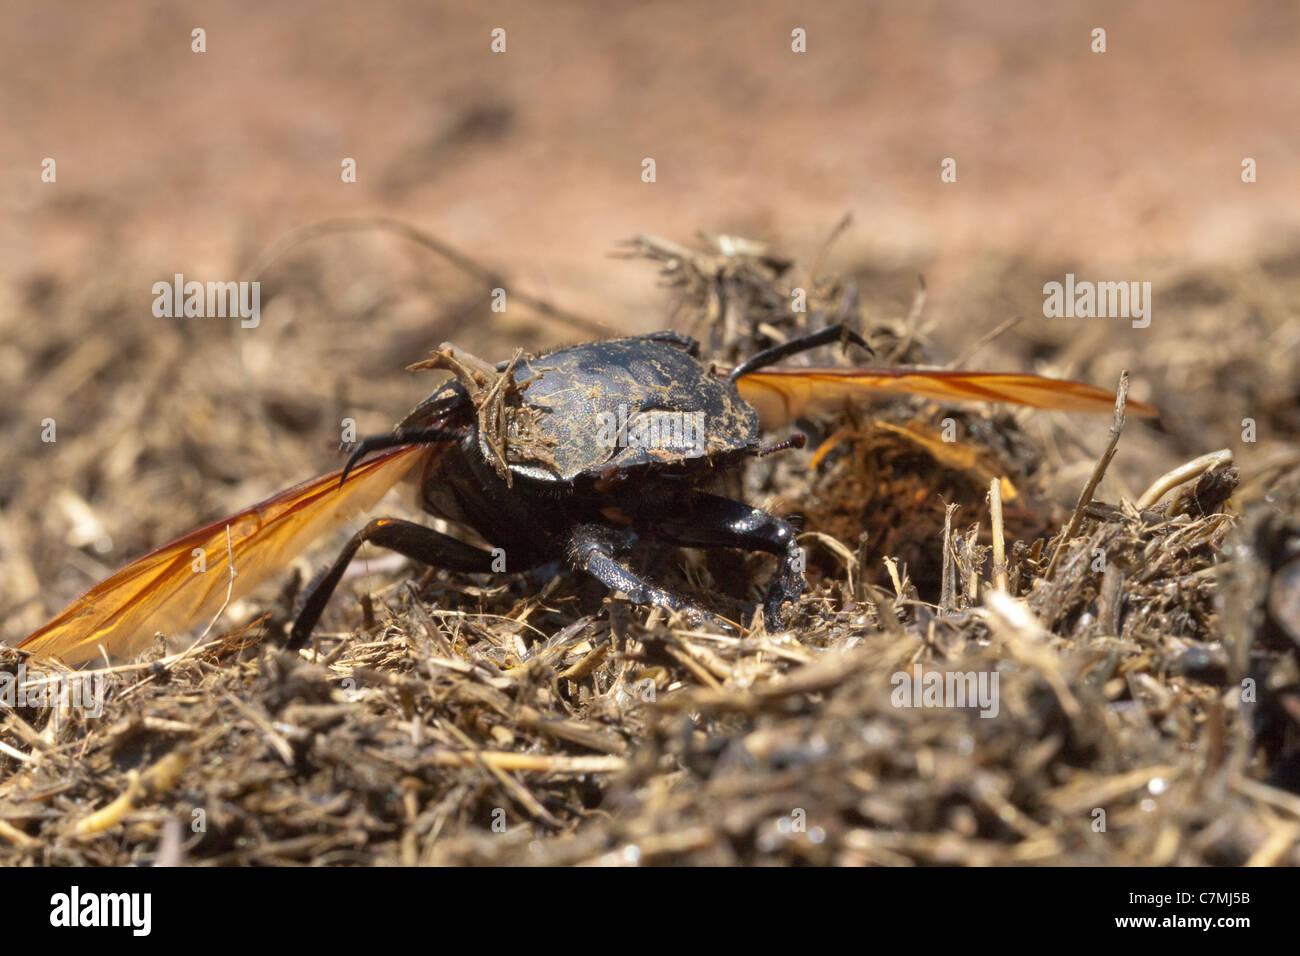 Giant Flattened Dungbeetle Lift-off (pachylomerus femoralis). - Stock Image